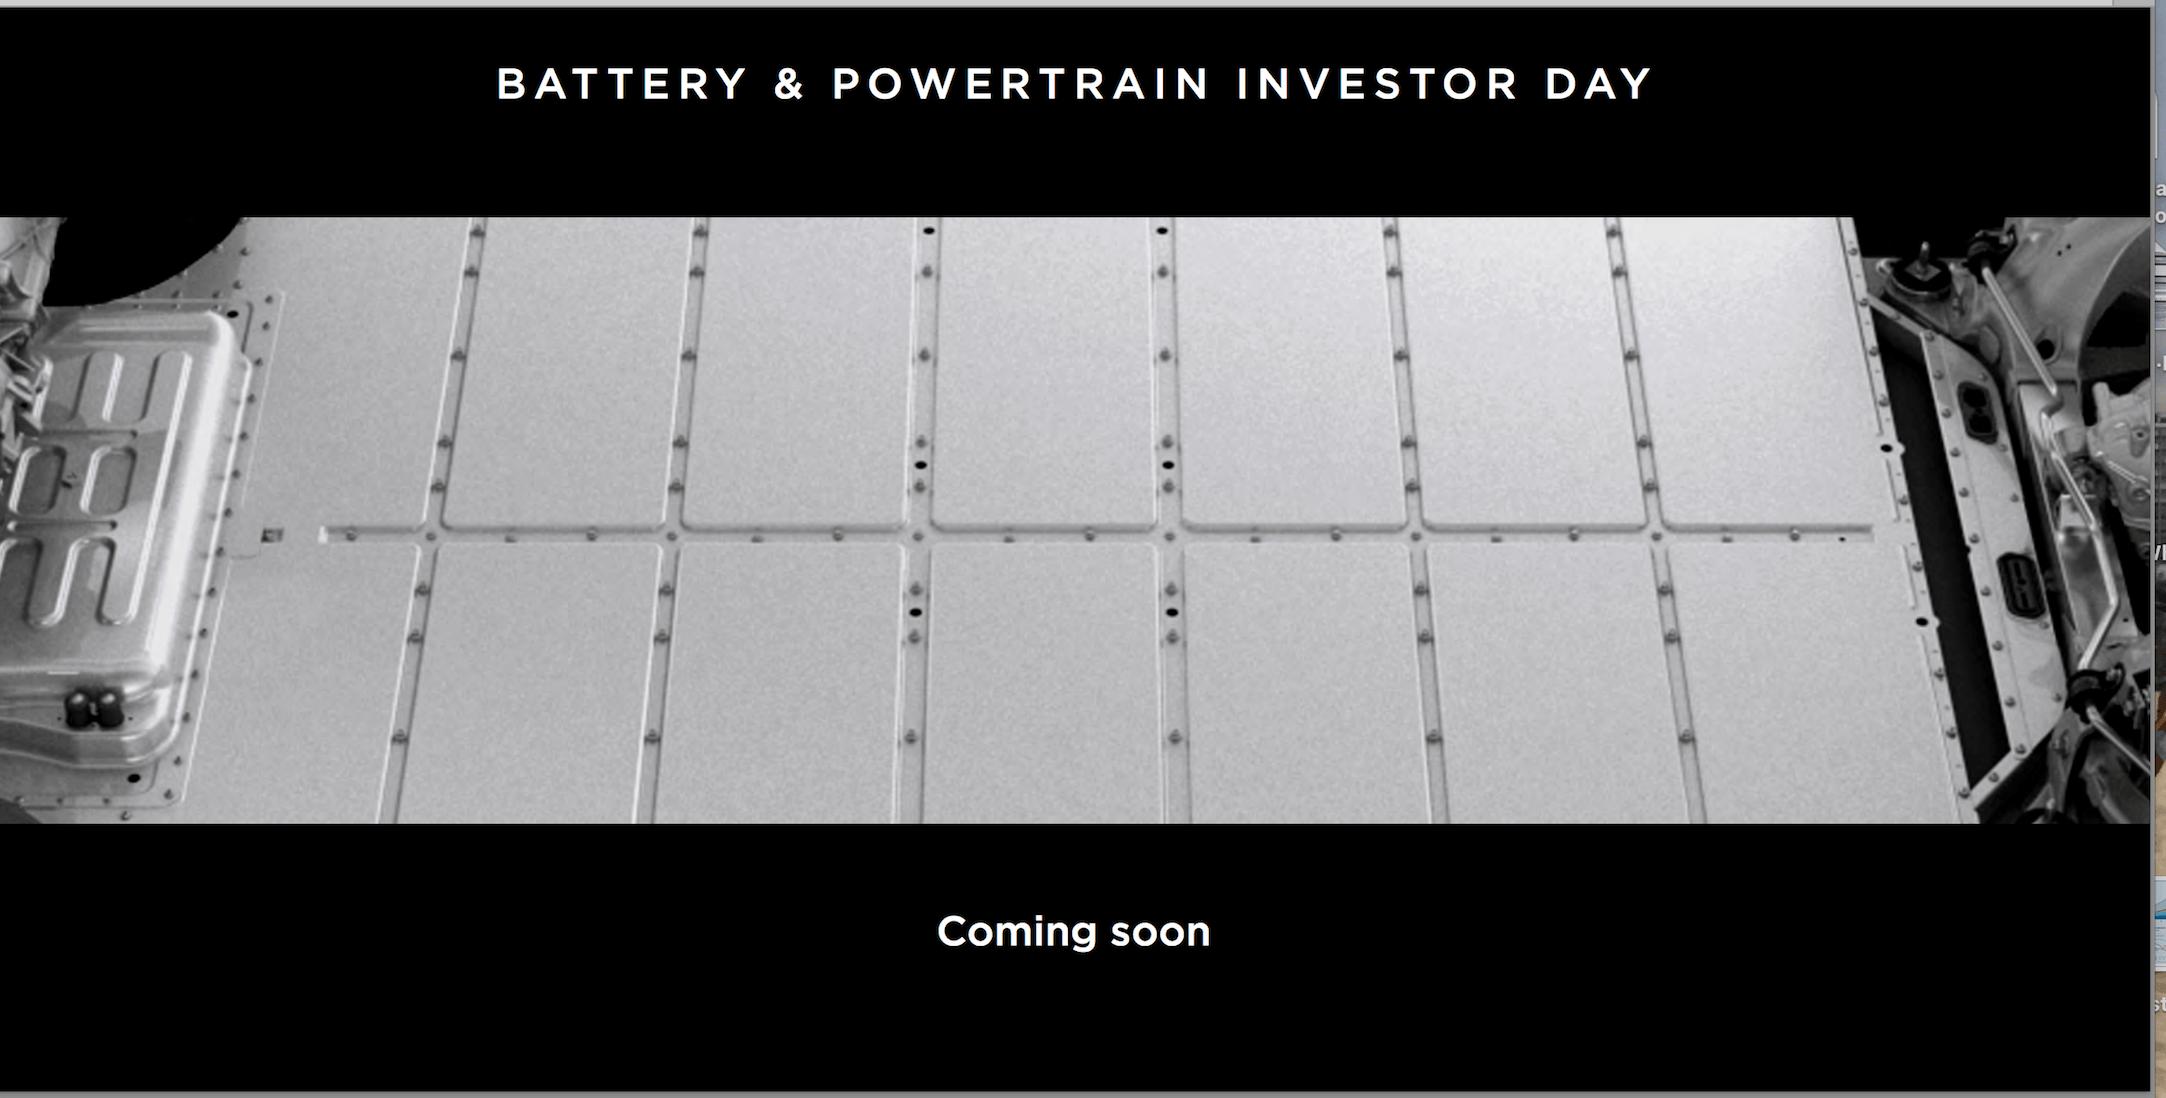 Battery Developments Coming Thick And Fast For Tesla - Tesla, Inc. (NASDAQ:TSLA) | Seeking Alpha